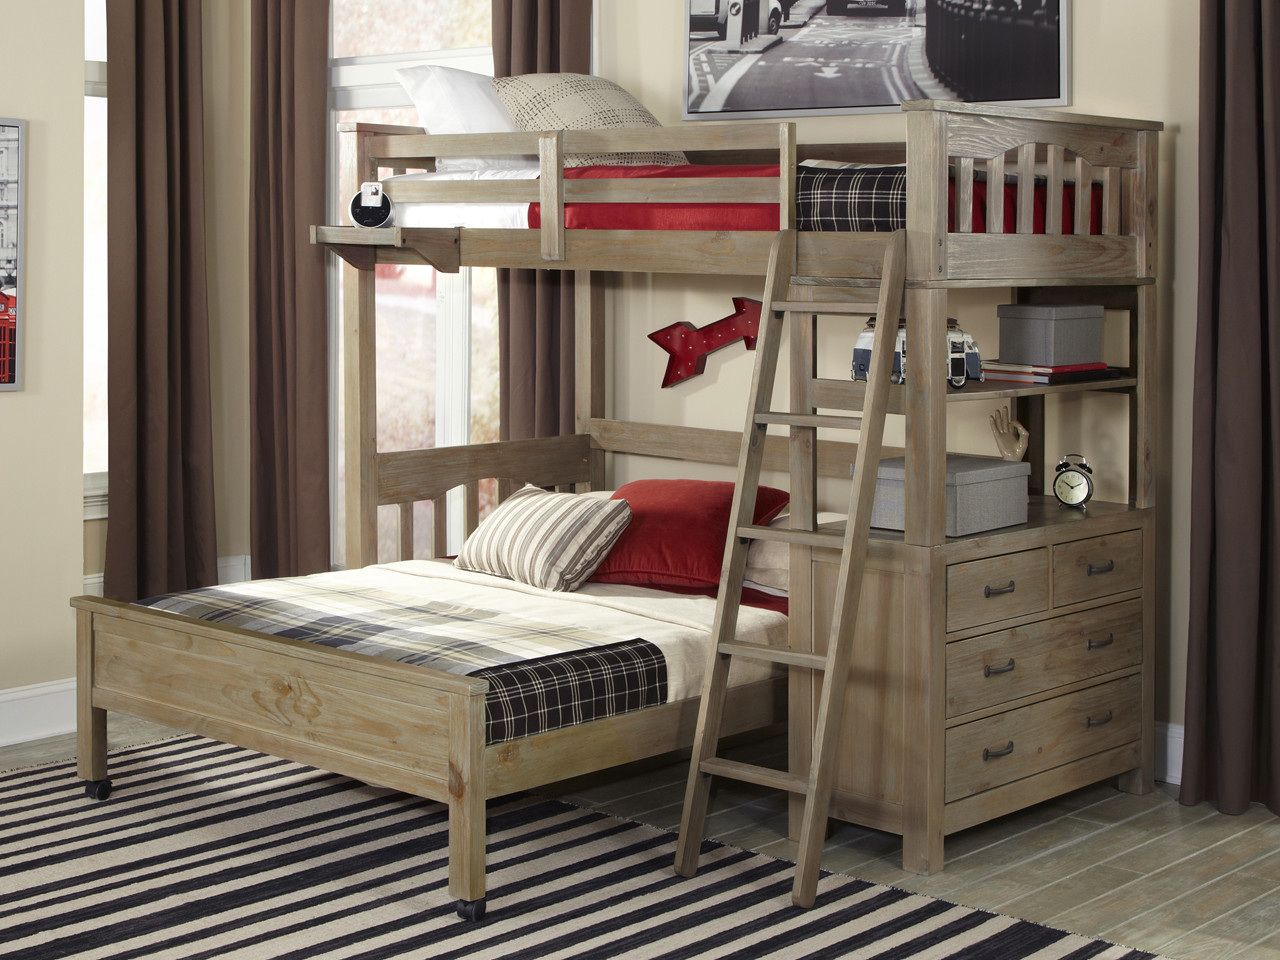 seaview loft bed twin full driftwood